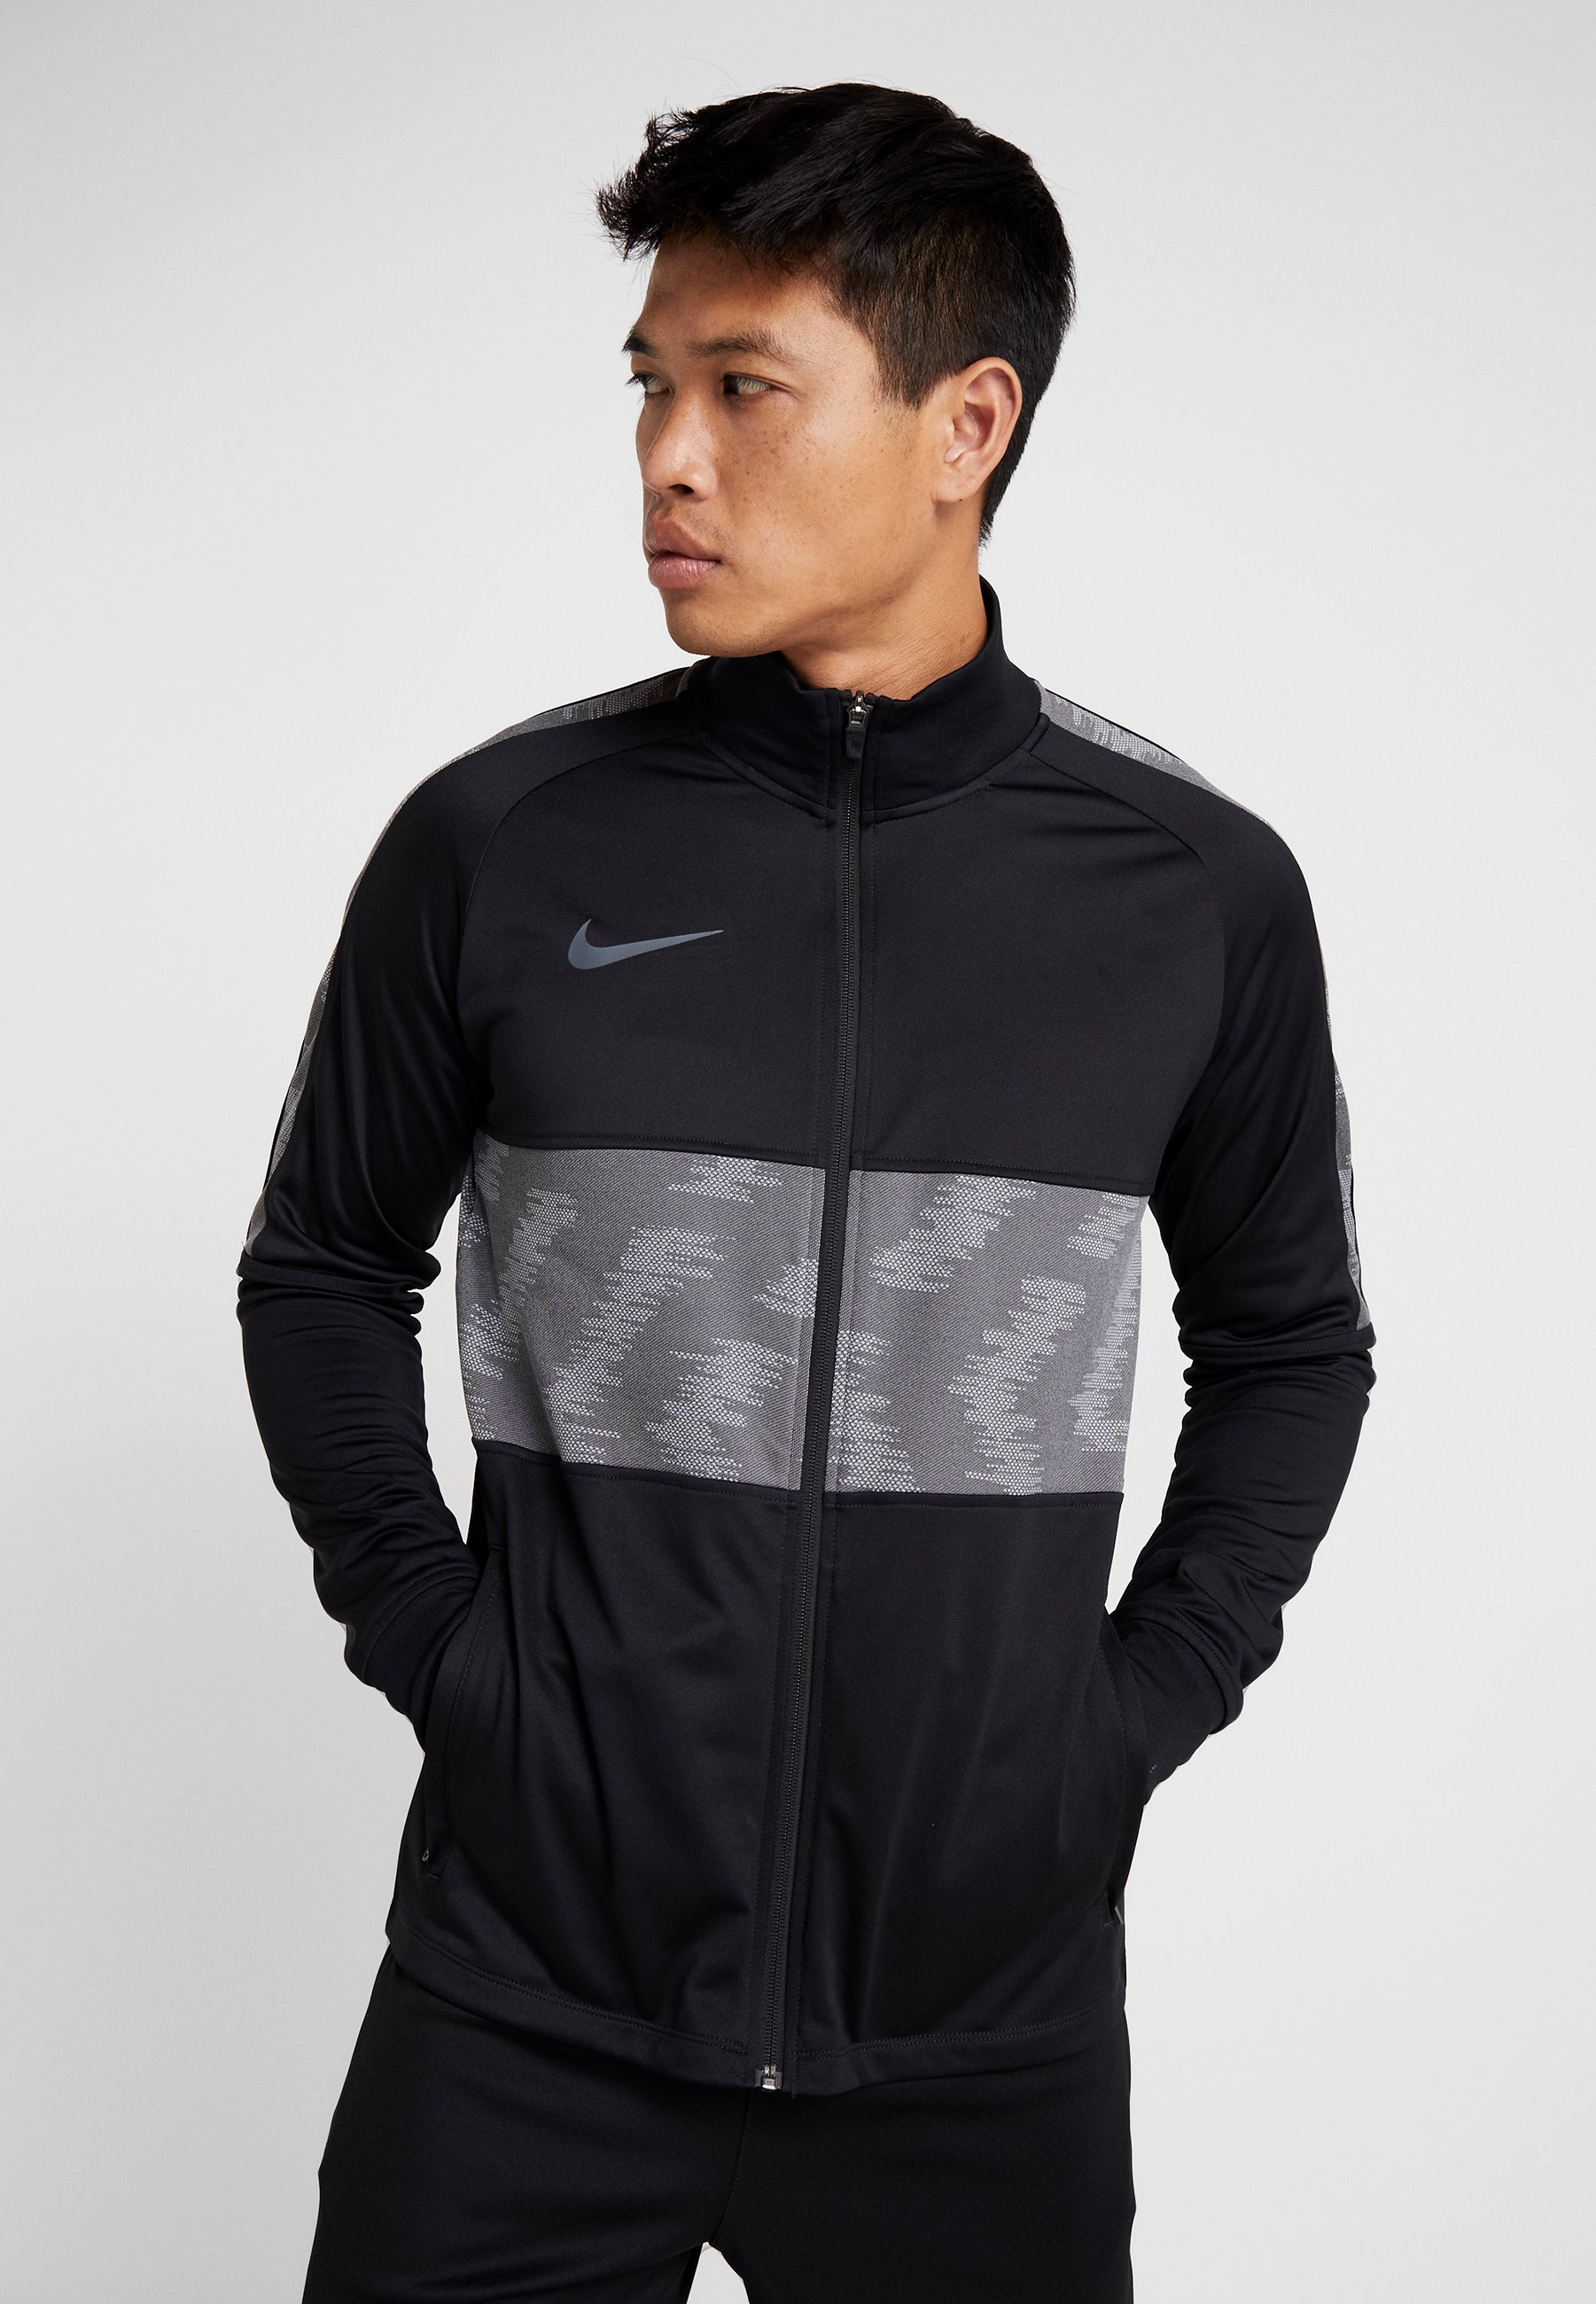 DryVeste anthracite Nike Grey Performance De wolf Black Survêtement TcK31FlJ